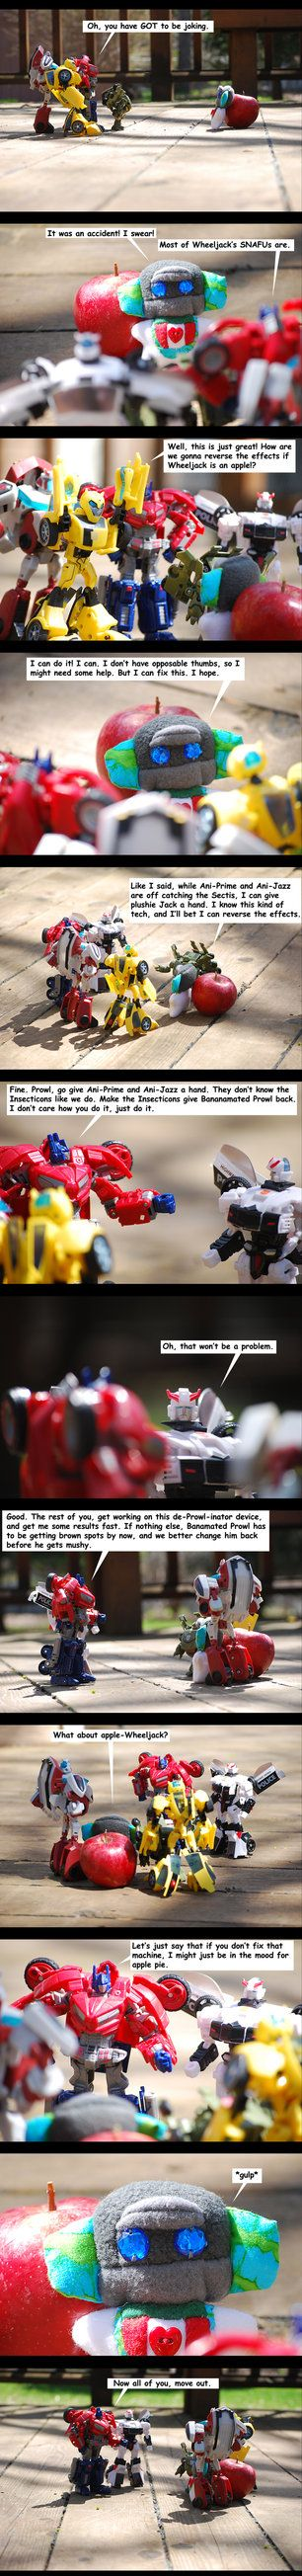 The Engineer Strikes Back - 5 by The-Starhorse.deviantart.com on @DeviantArt